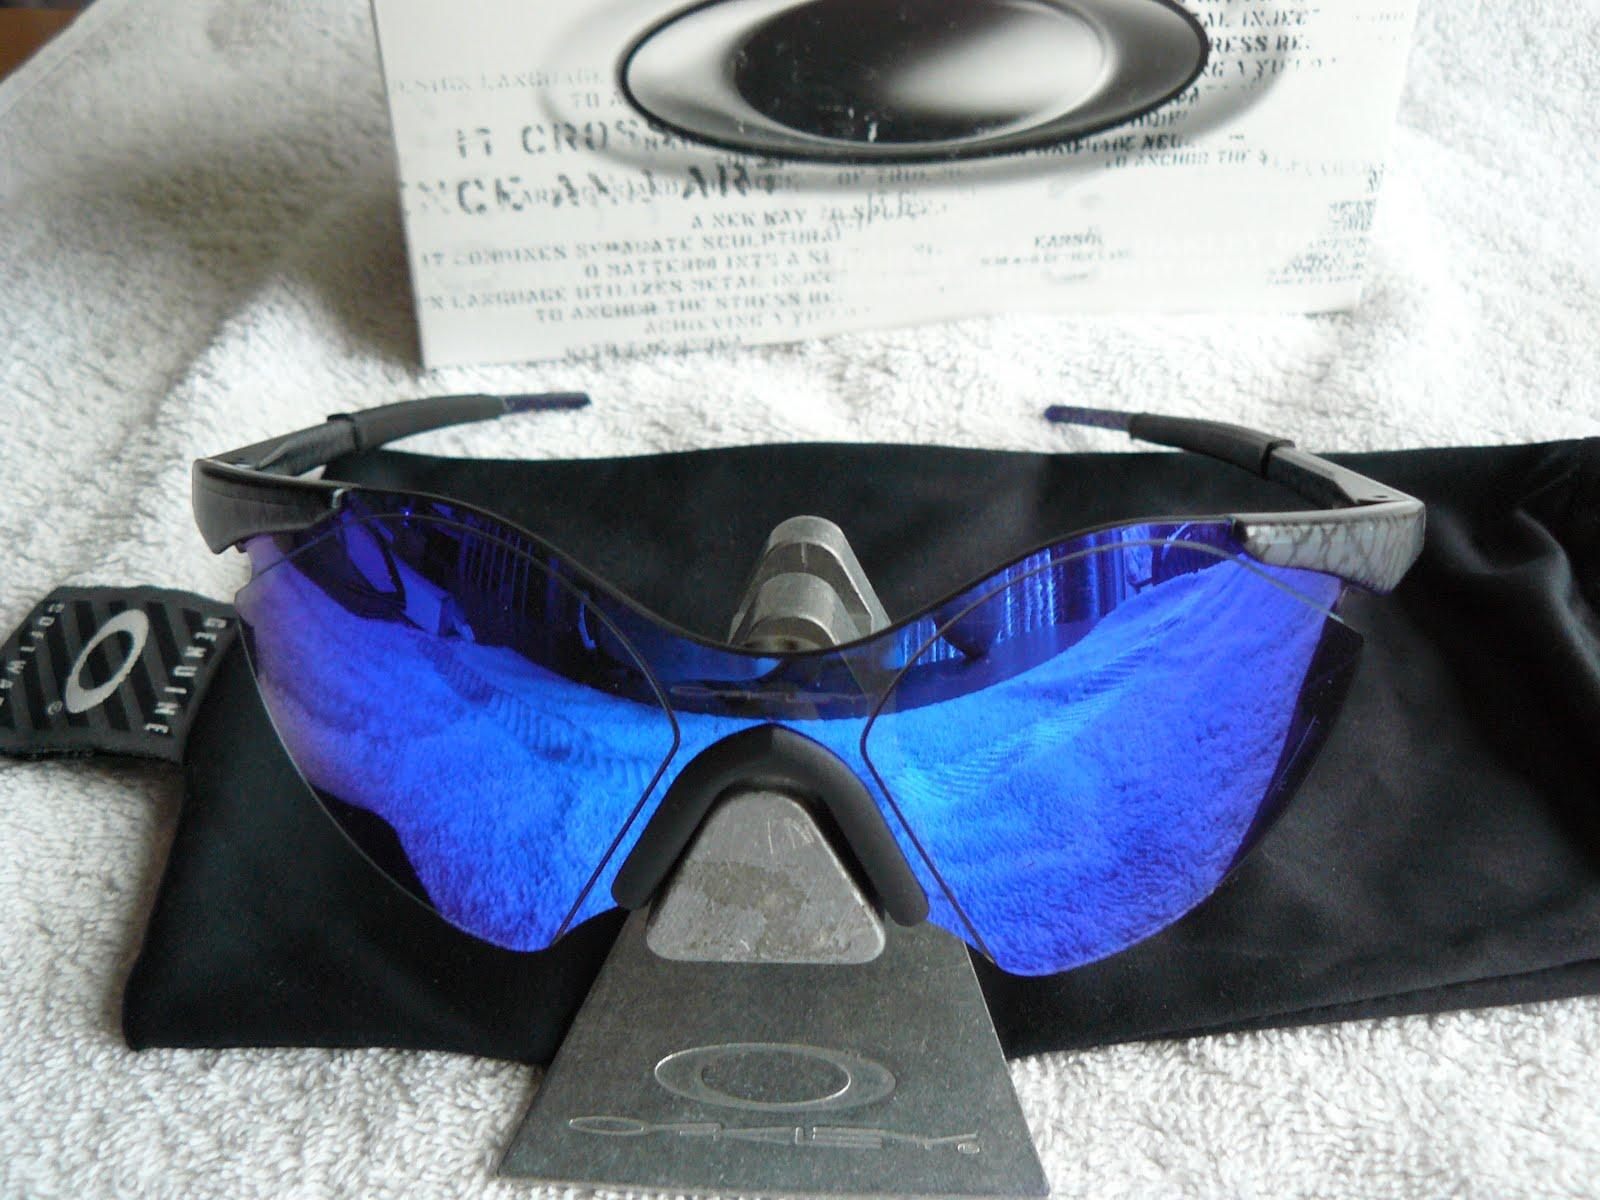 66095fbeb8f Zero 0.6 Cobalt frame with Blue Iridium lenses. SKU 05-207 (1993)